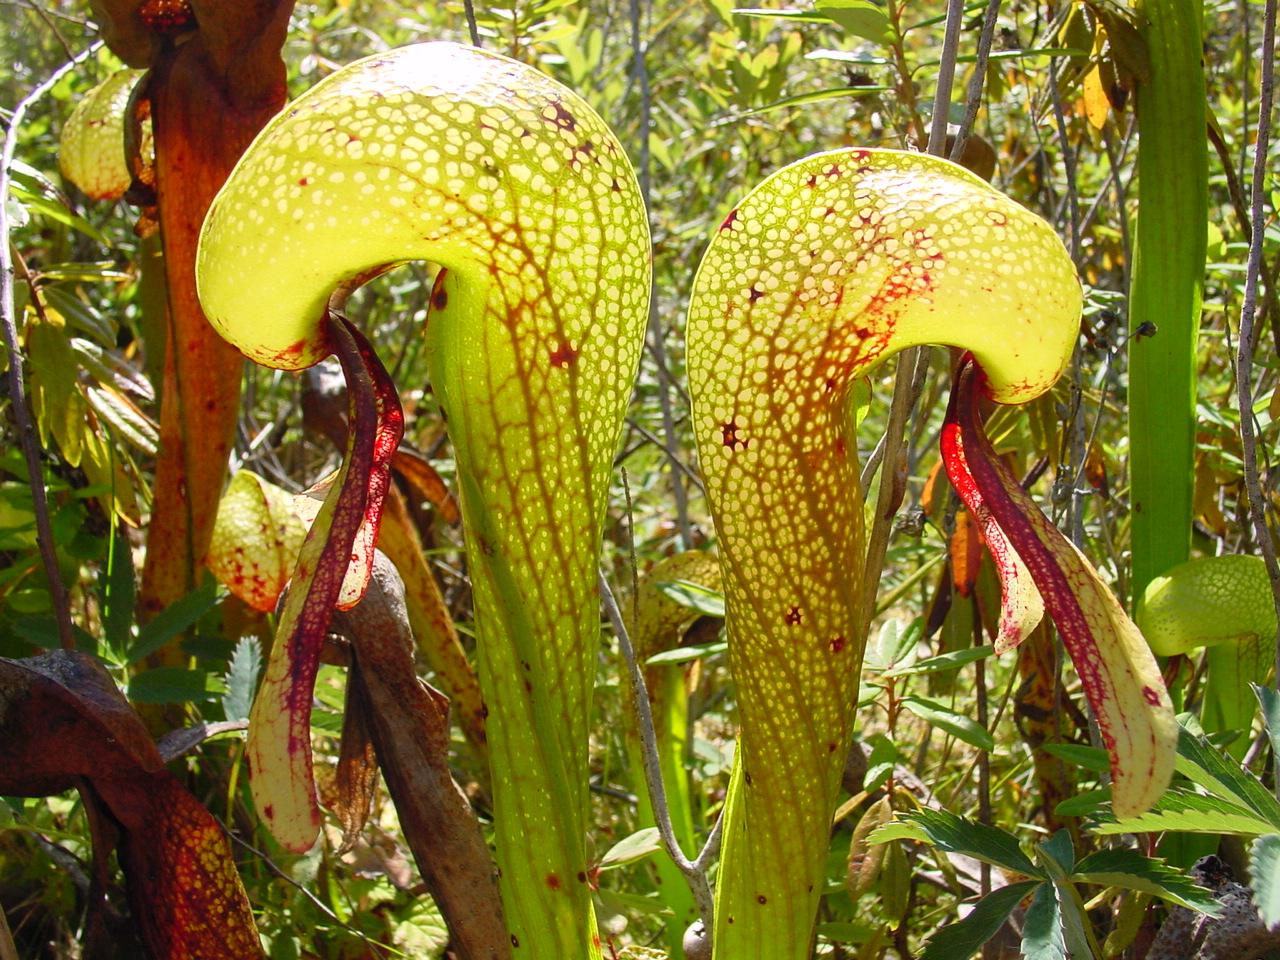 File:Darlingtonia californica ne9.JPG - Wikimedia Commons